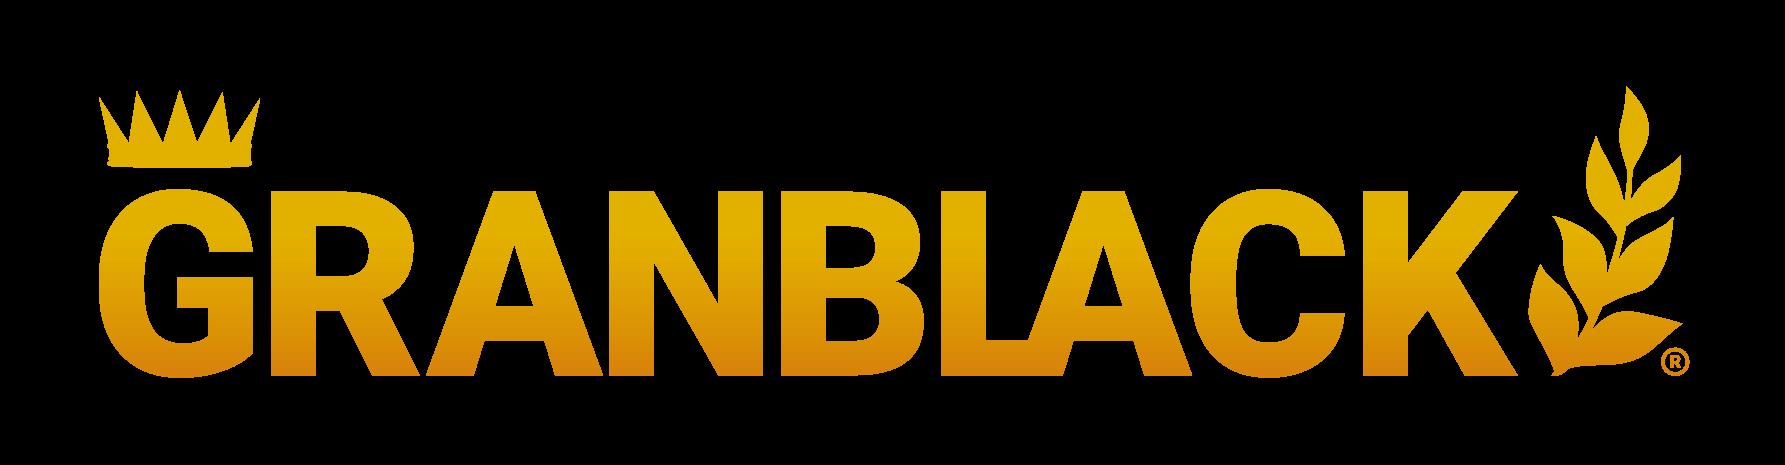 GRANBLACK Logotipo Horizontal